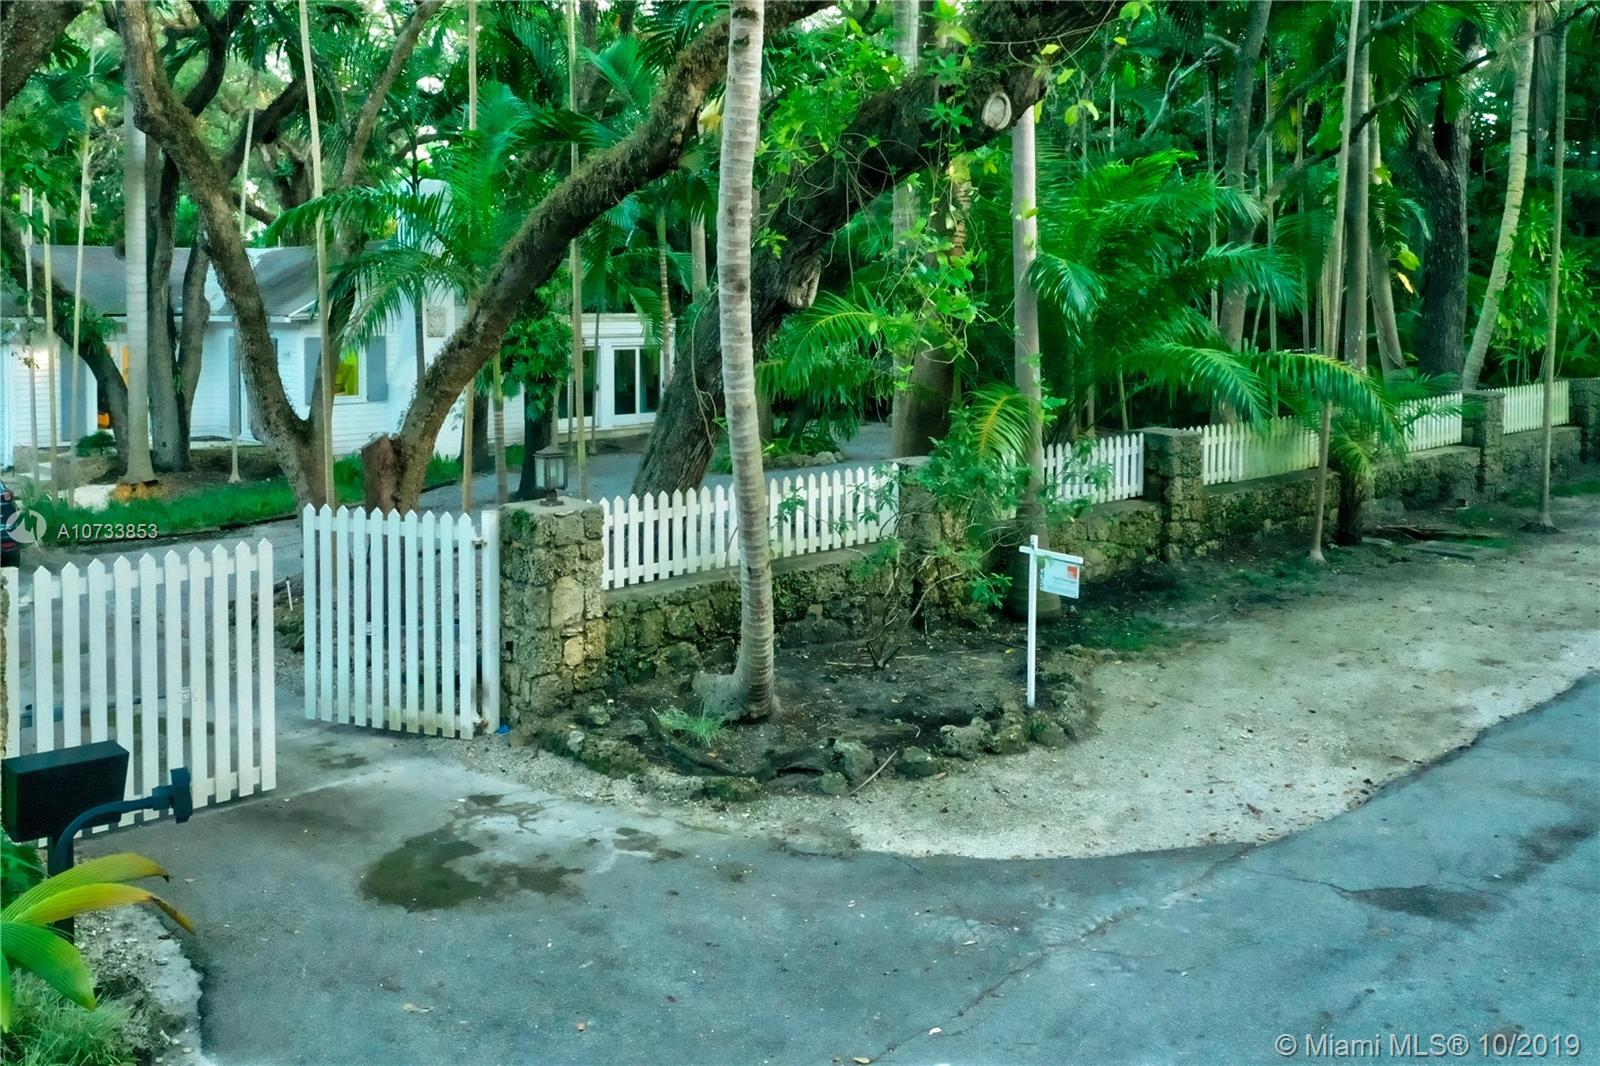 Biscayne Park Terrace # - 02 - photo